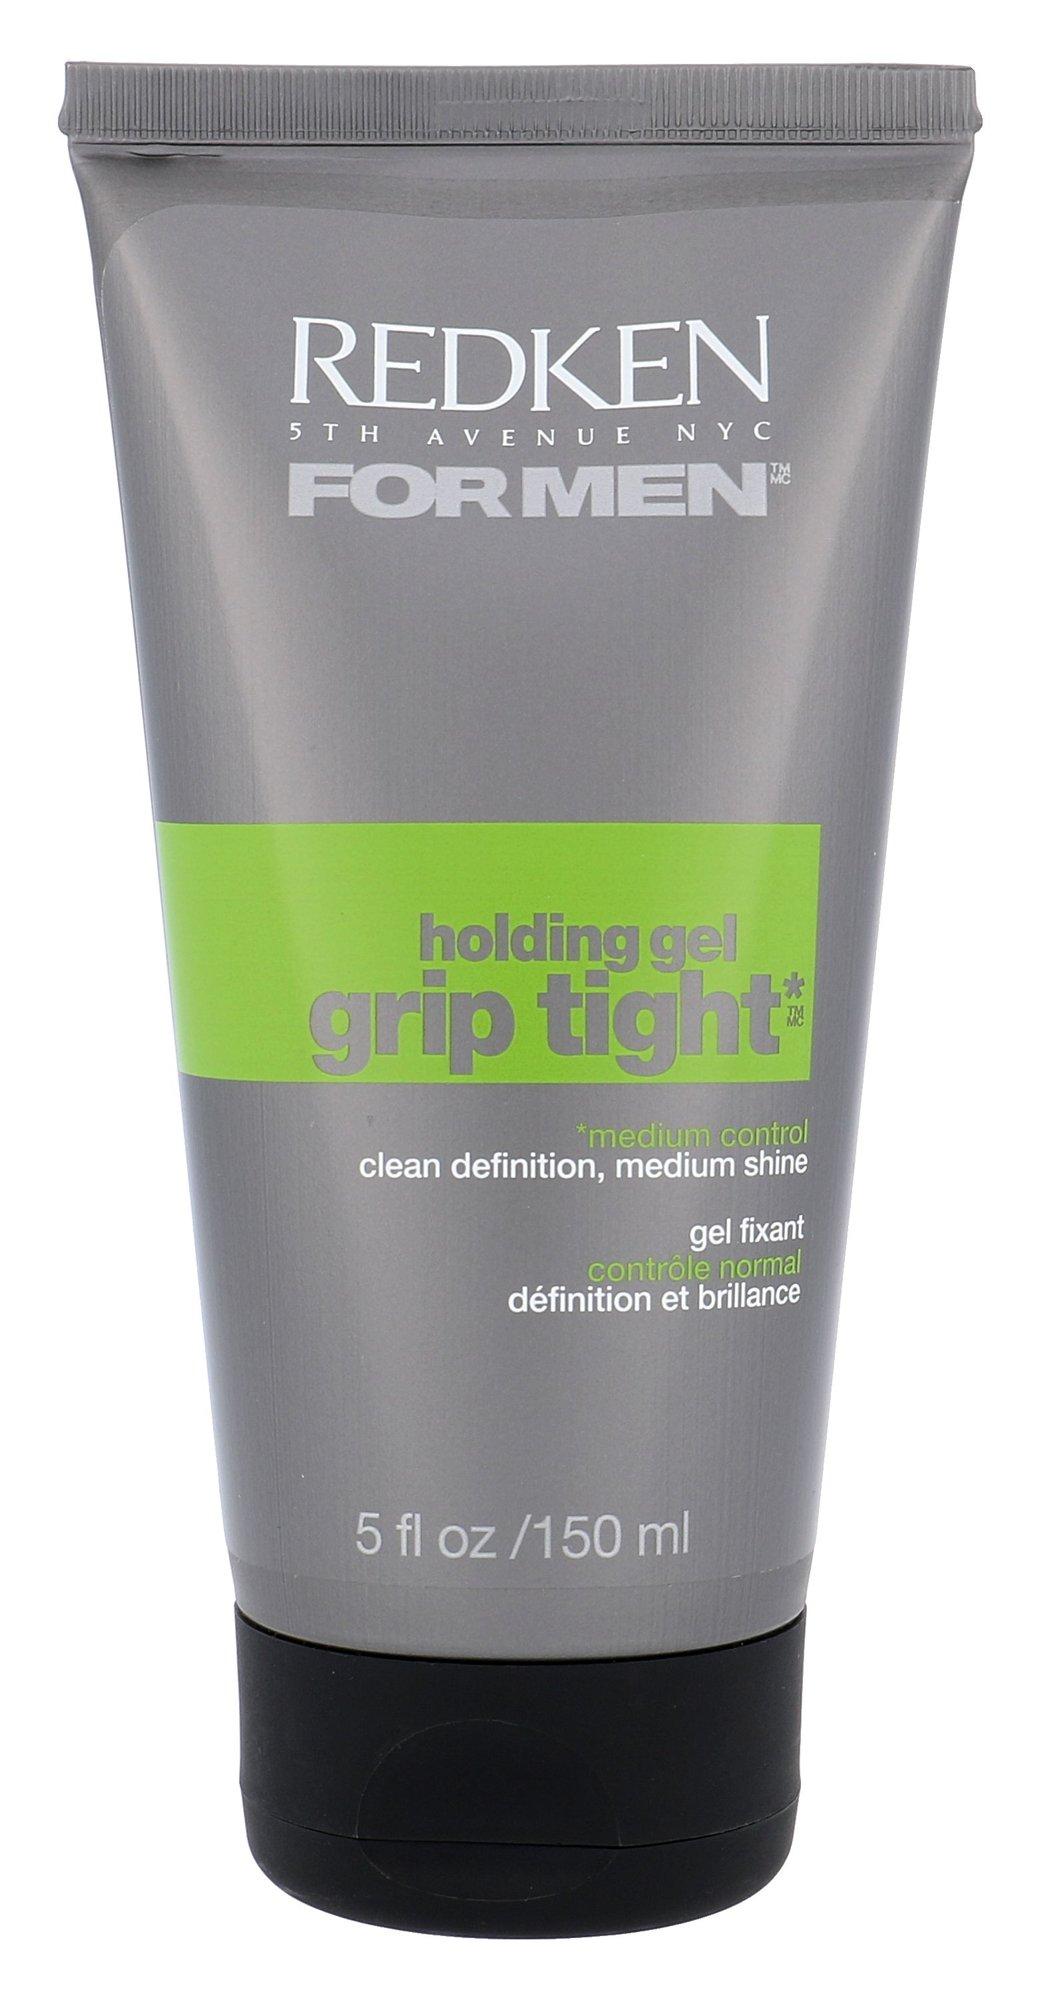 Redken For Men Cosmetic 150ml